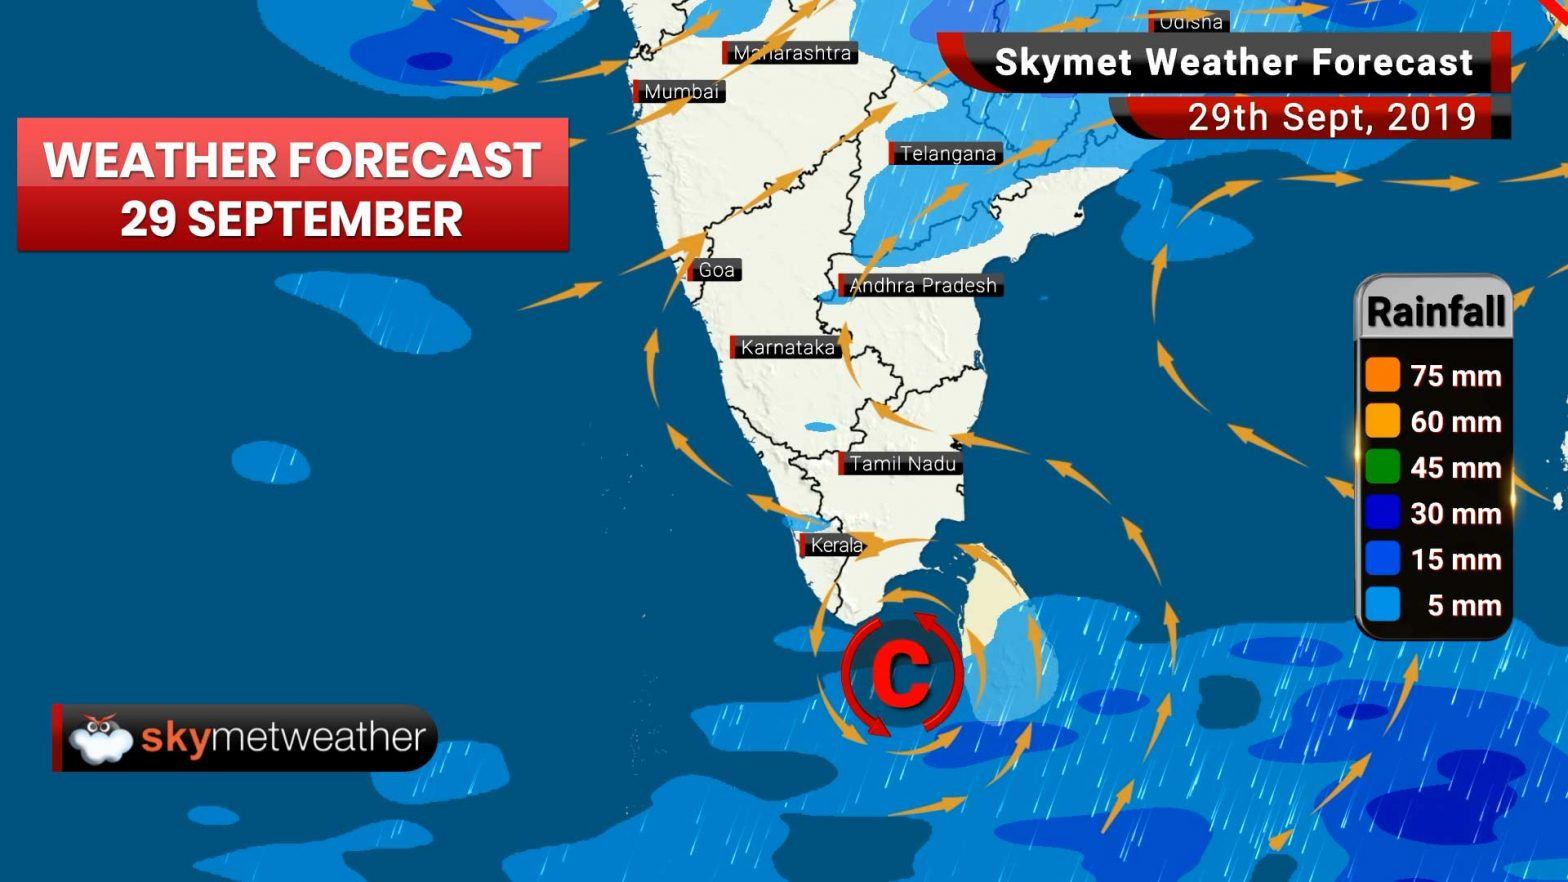 Weather Forecast Sept 29: Patna, Bhagalpur, Purnea, Gwalior, Ahmedabad, Vadodara to see heavy rain